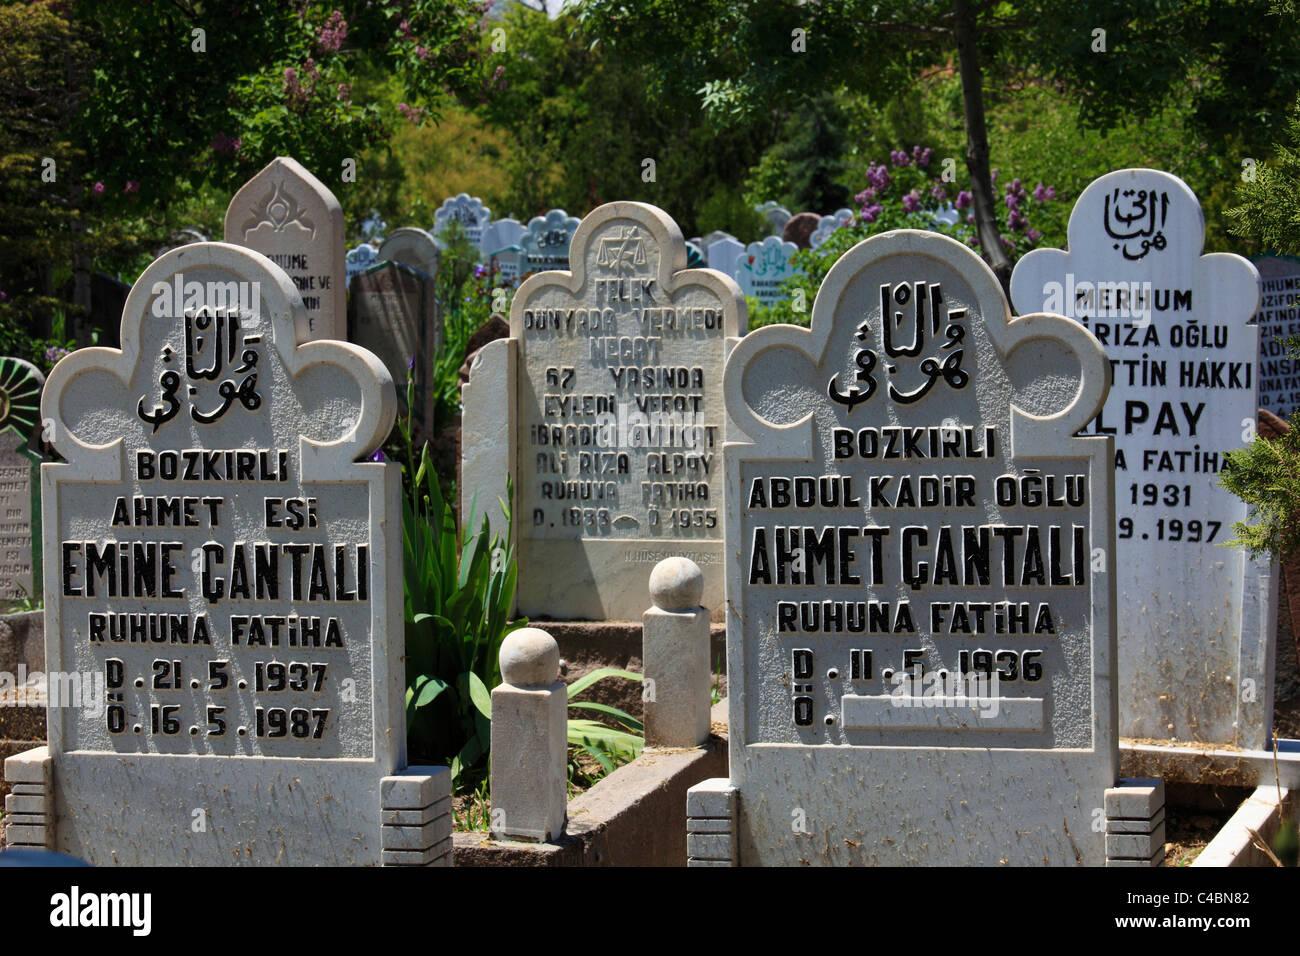 Turkey, Konya, muslim cemetery, tombstones, - Stock Image